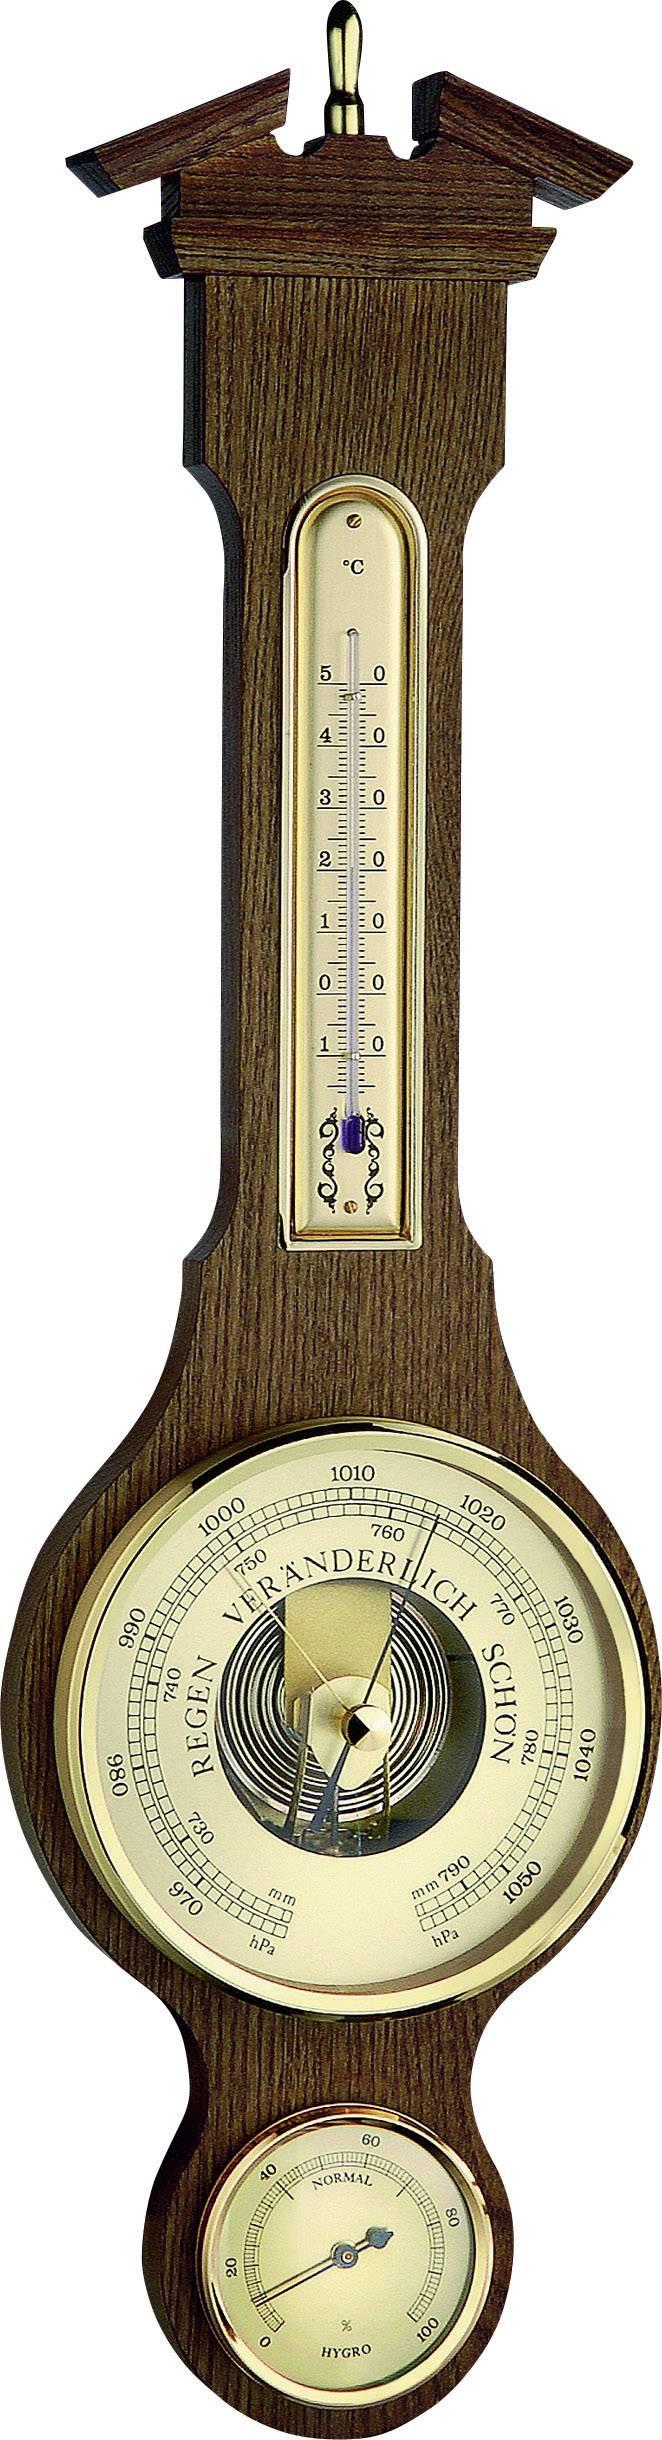 Analógová meteostanica Fischer Wetter Sheraton 542411, dub